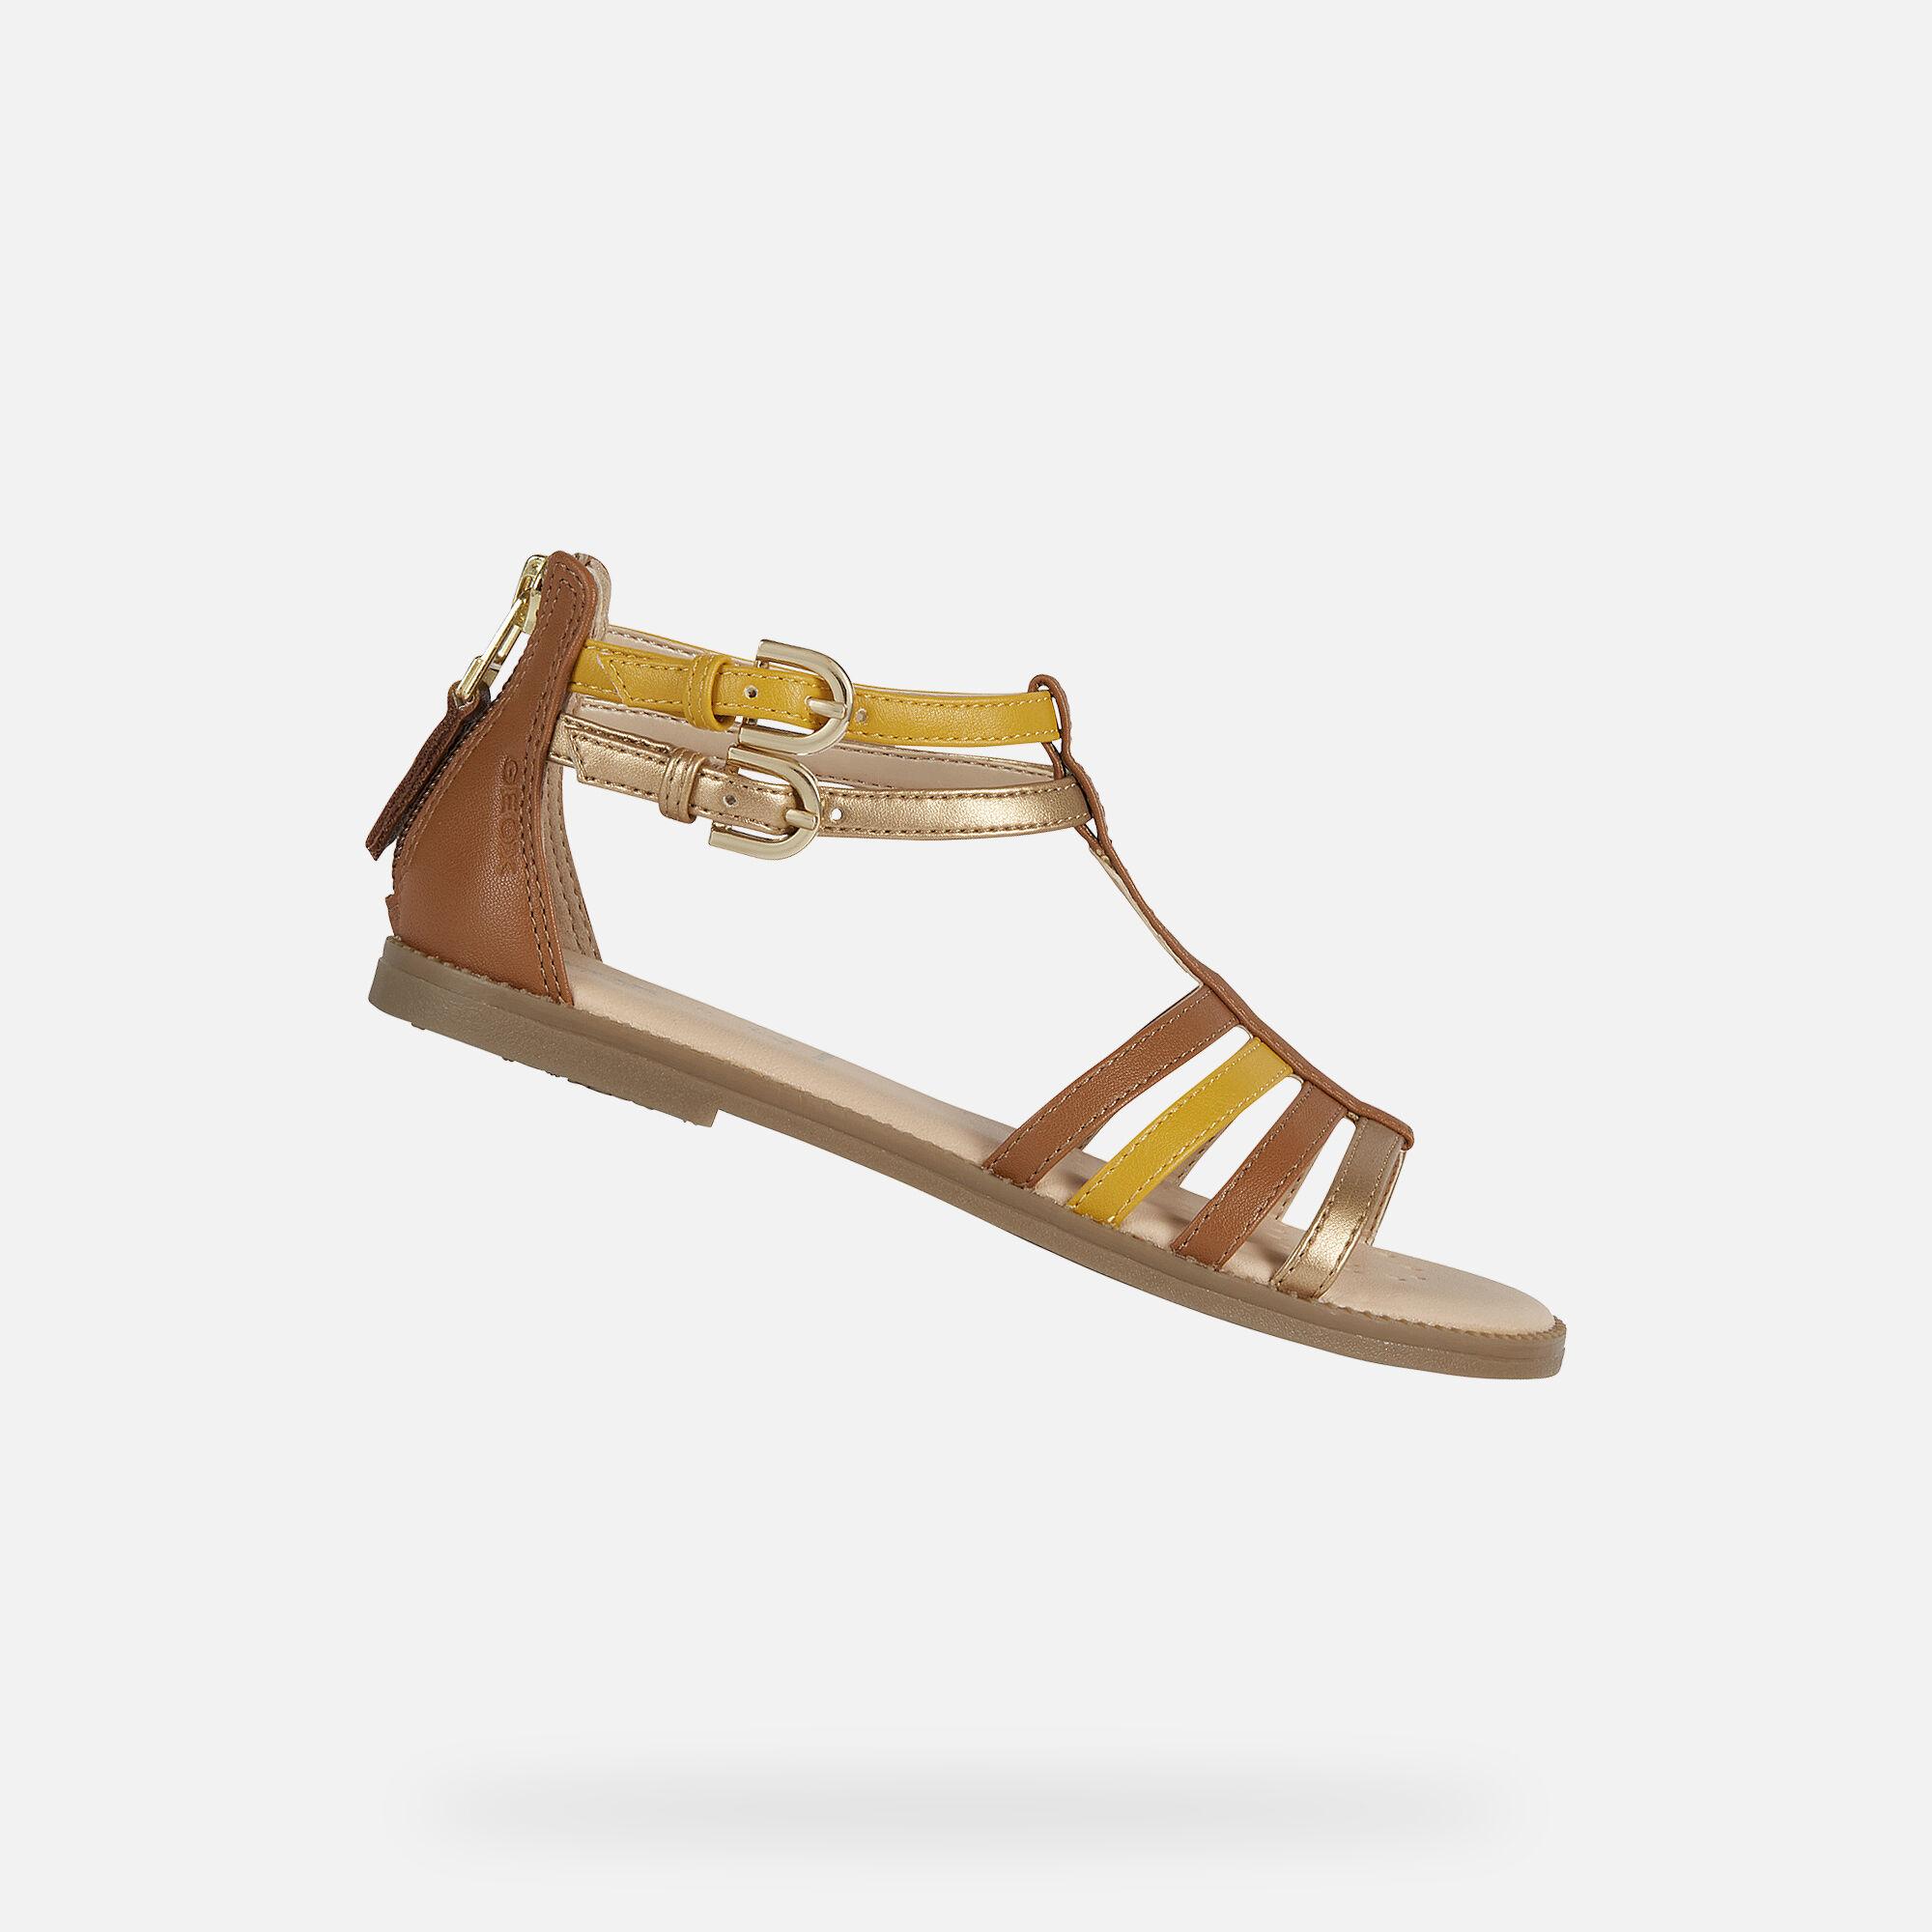 analizar Cartas credenciales Desalentar  geox childrens sandals where to buy 87820 6f7c4